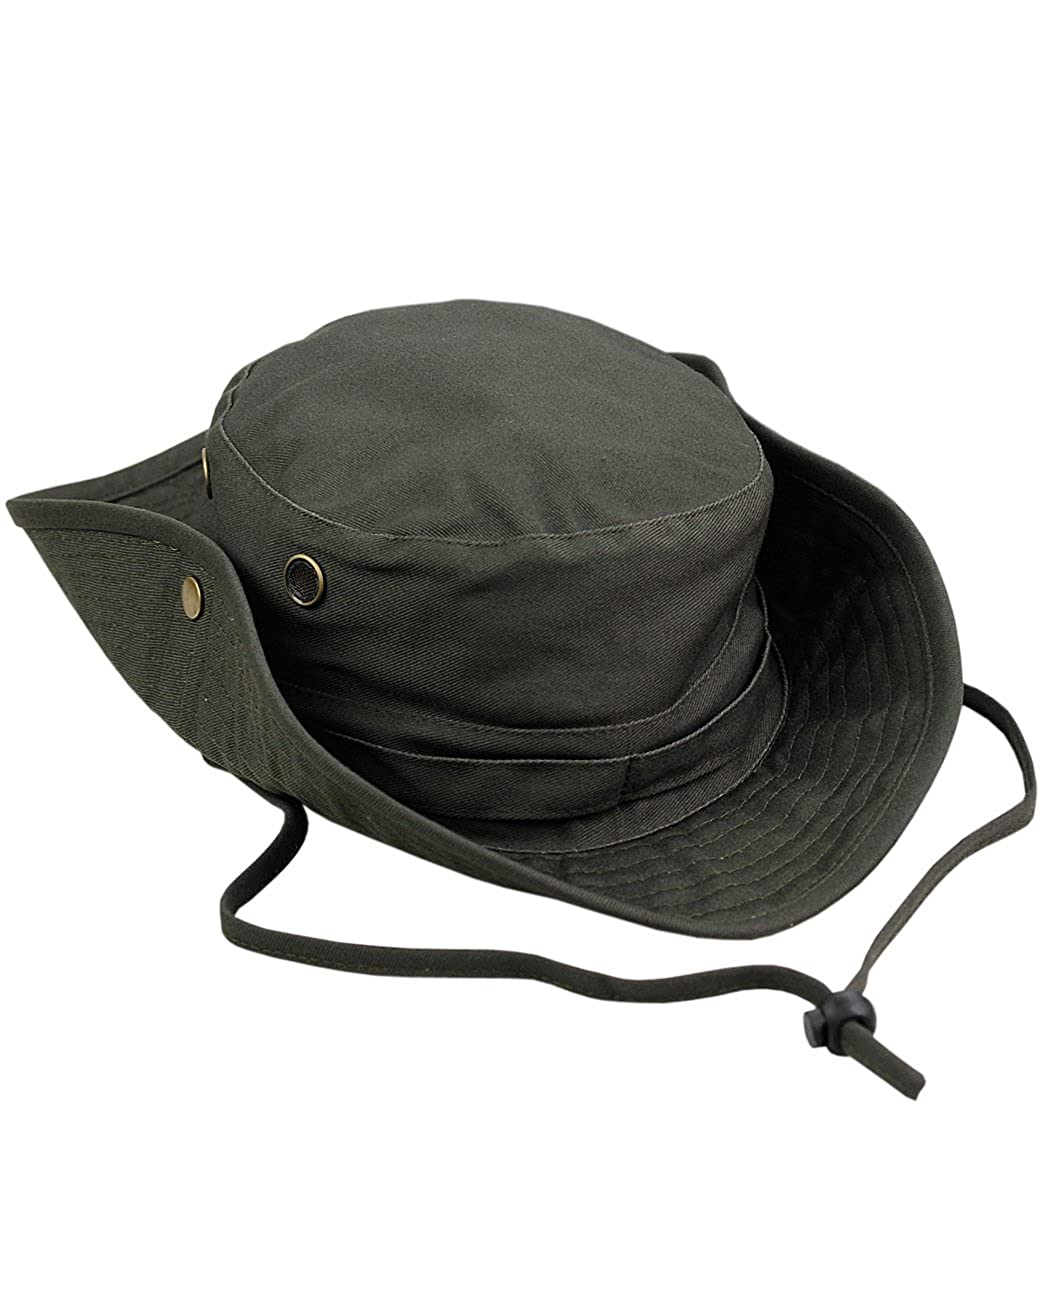 b6a31aba115 NYFASHION101 Men s Crushable Snap Brim Cotton Outdoor Bucket Sun Hat Black  OD1890-BK larger image